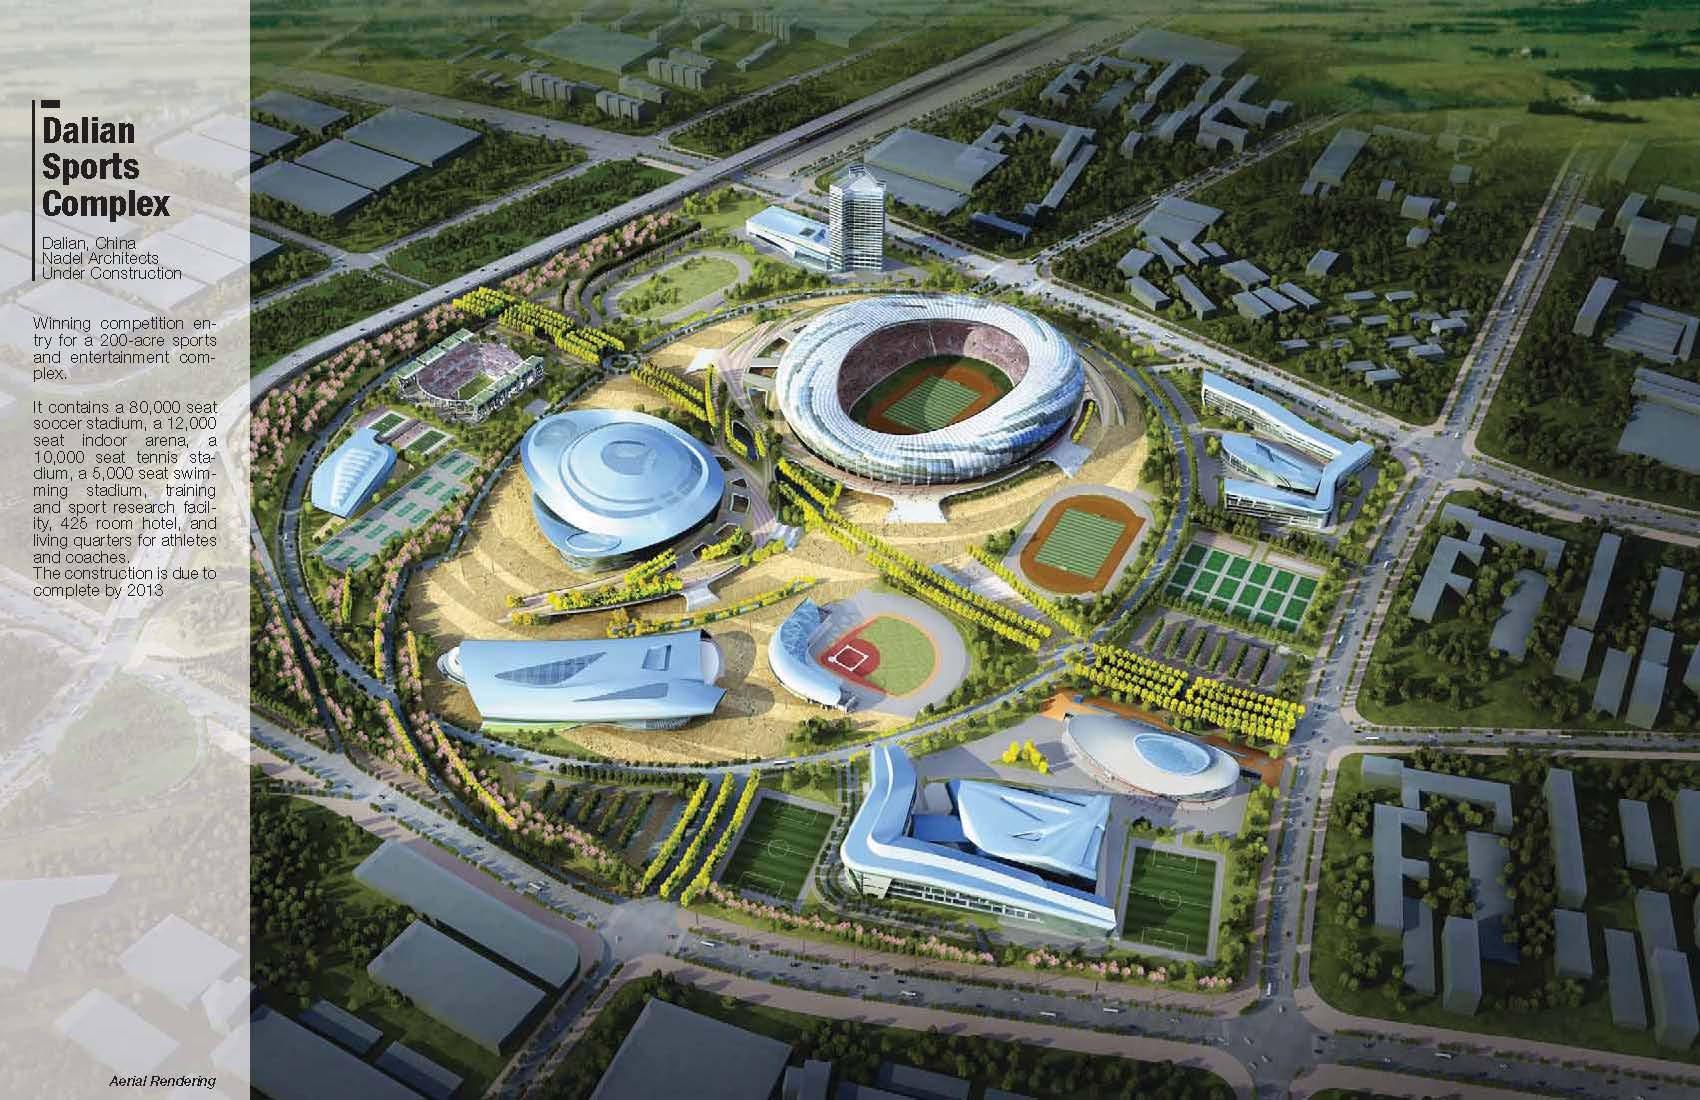 Dalian Sports Complex  Andre Abrahamian AIA  Archinect